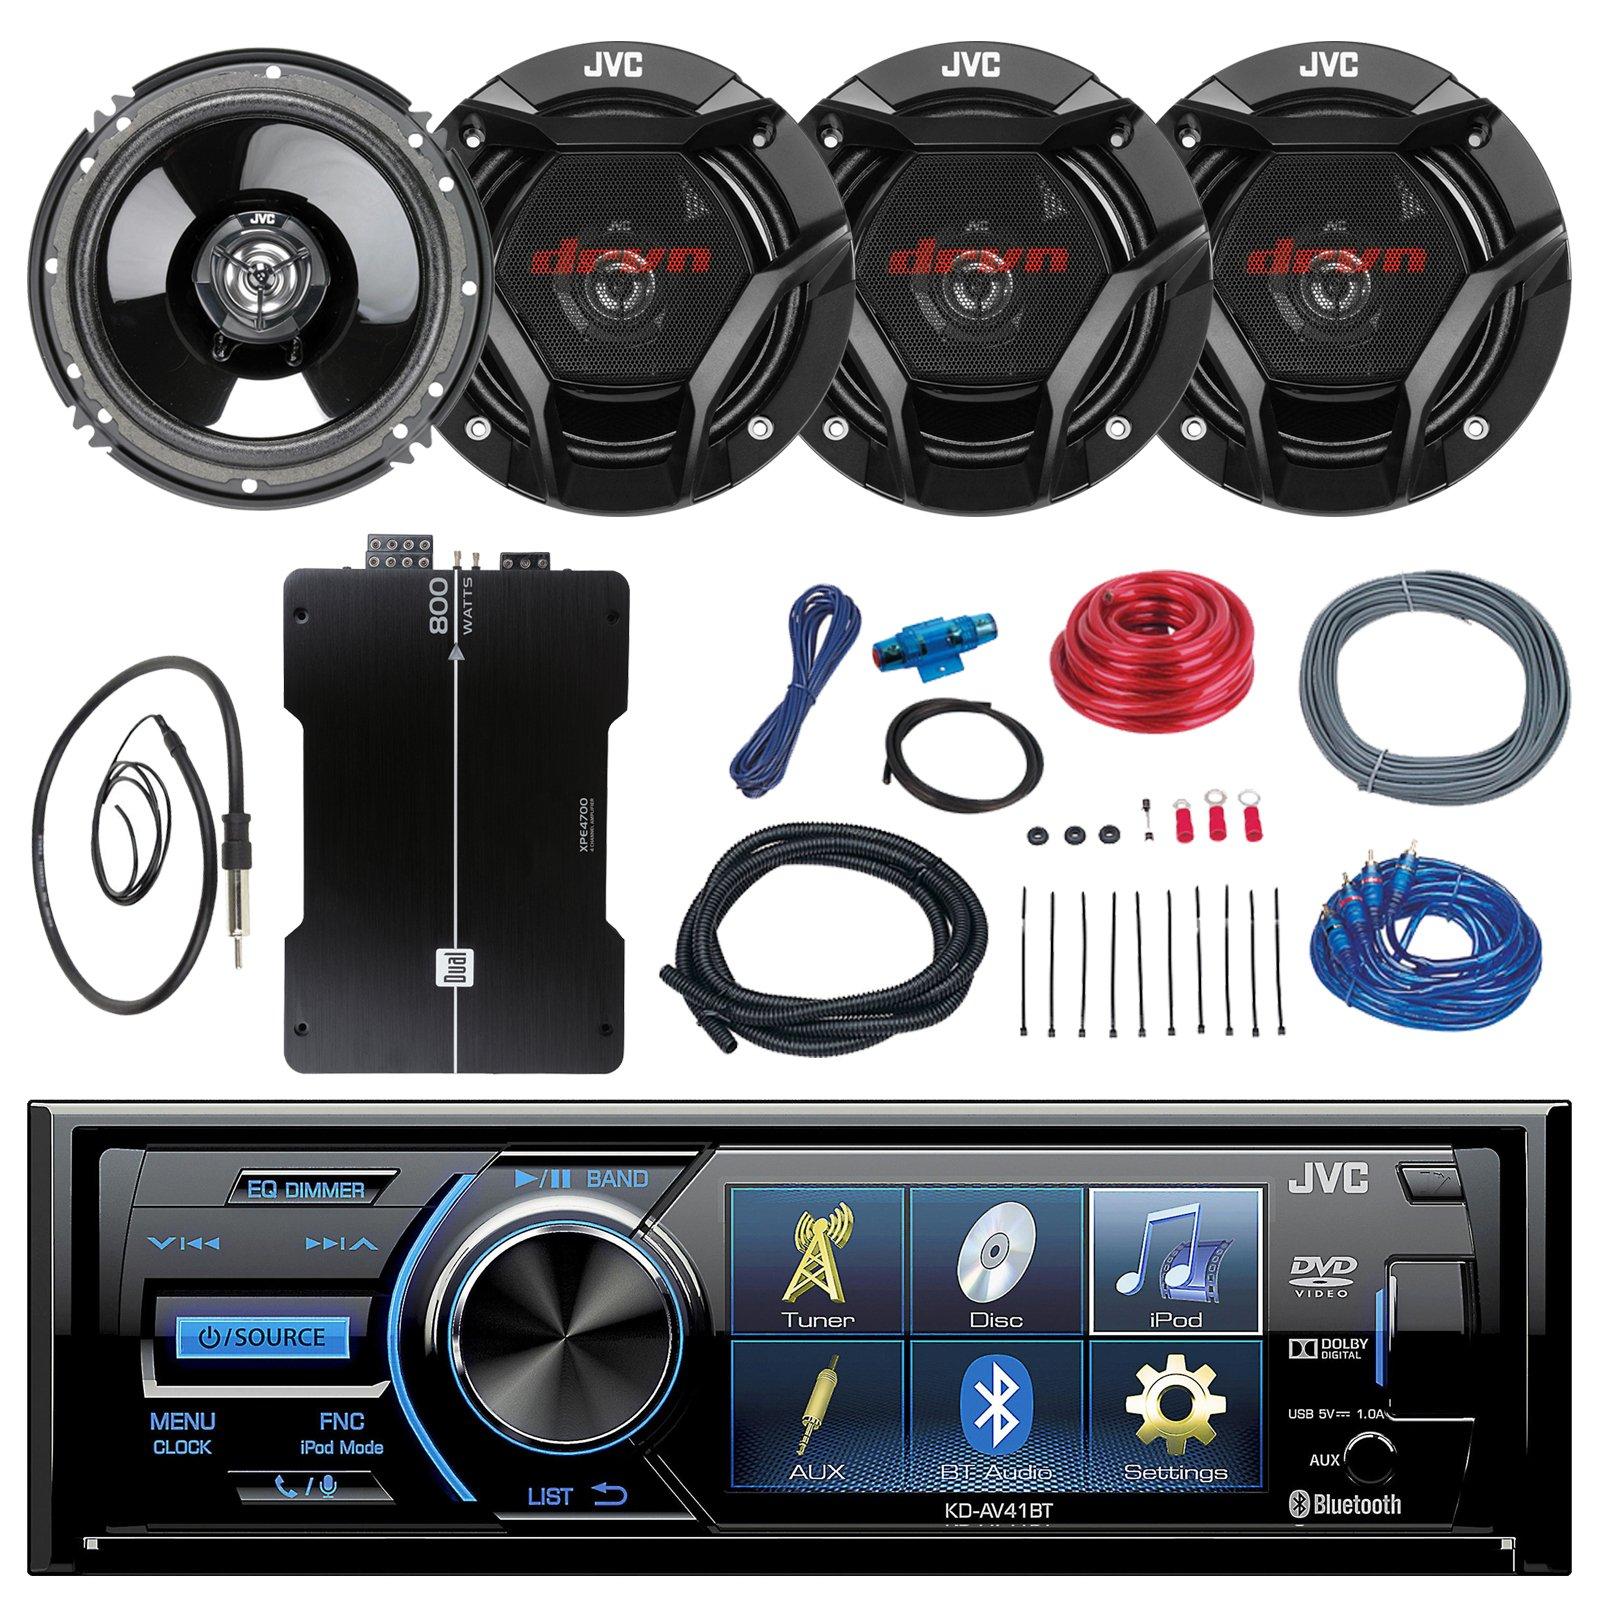 JVC KD-AV41BT 3'' Car DVD Bluetooth Stereo Receiver Bundle Combo With 4x 6.5'' 300 Watt 2-Way Coaxial Speakers + 800-Watt 4-Channel Amplifier With Installation Kit, Enrock 22'' AM/FM Radio Antenna by EnrockAudioBundle